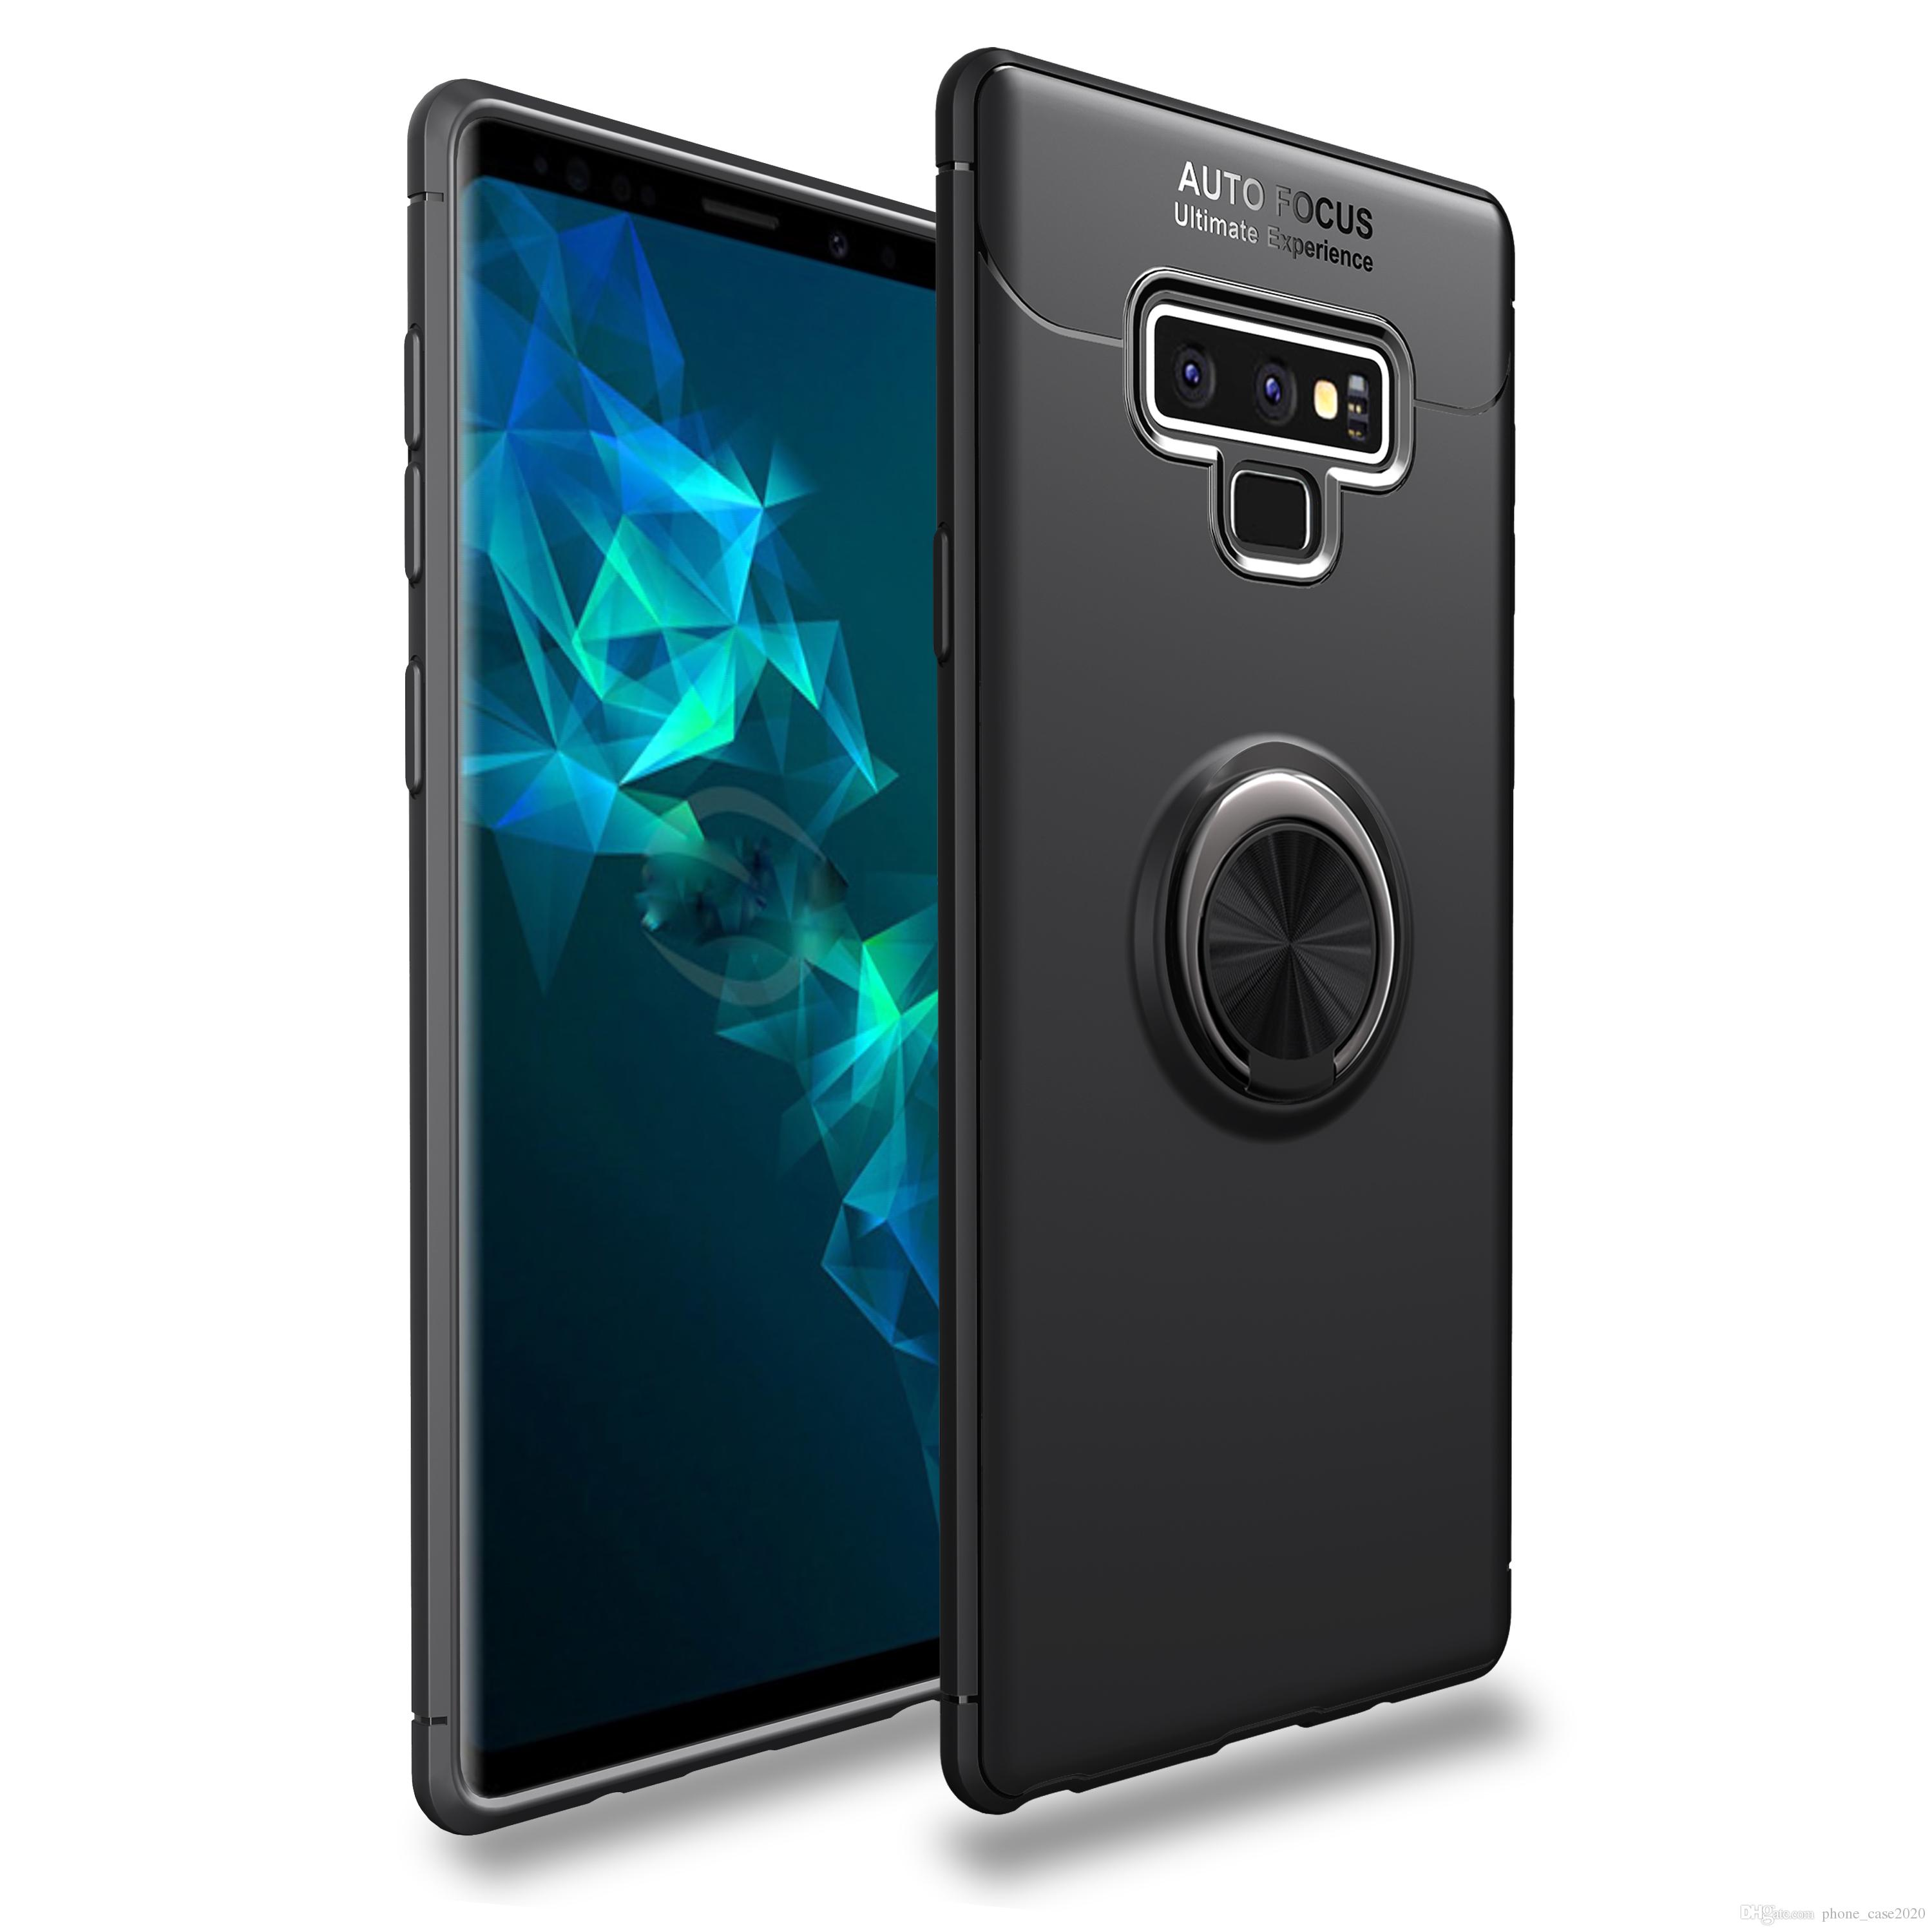 Huawei Handy Hüllen Ultra Dünner Dünner Finger Ring Ständer Weicher Kasten Für Samsung Galaxie Anmerkung 9 S9 S9 A6 A6 J8 J6 J4 S8 S8 Note8 Outdoor